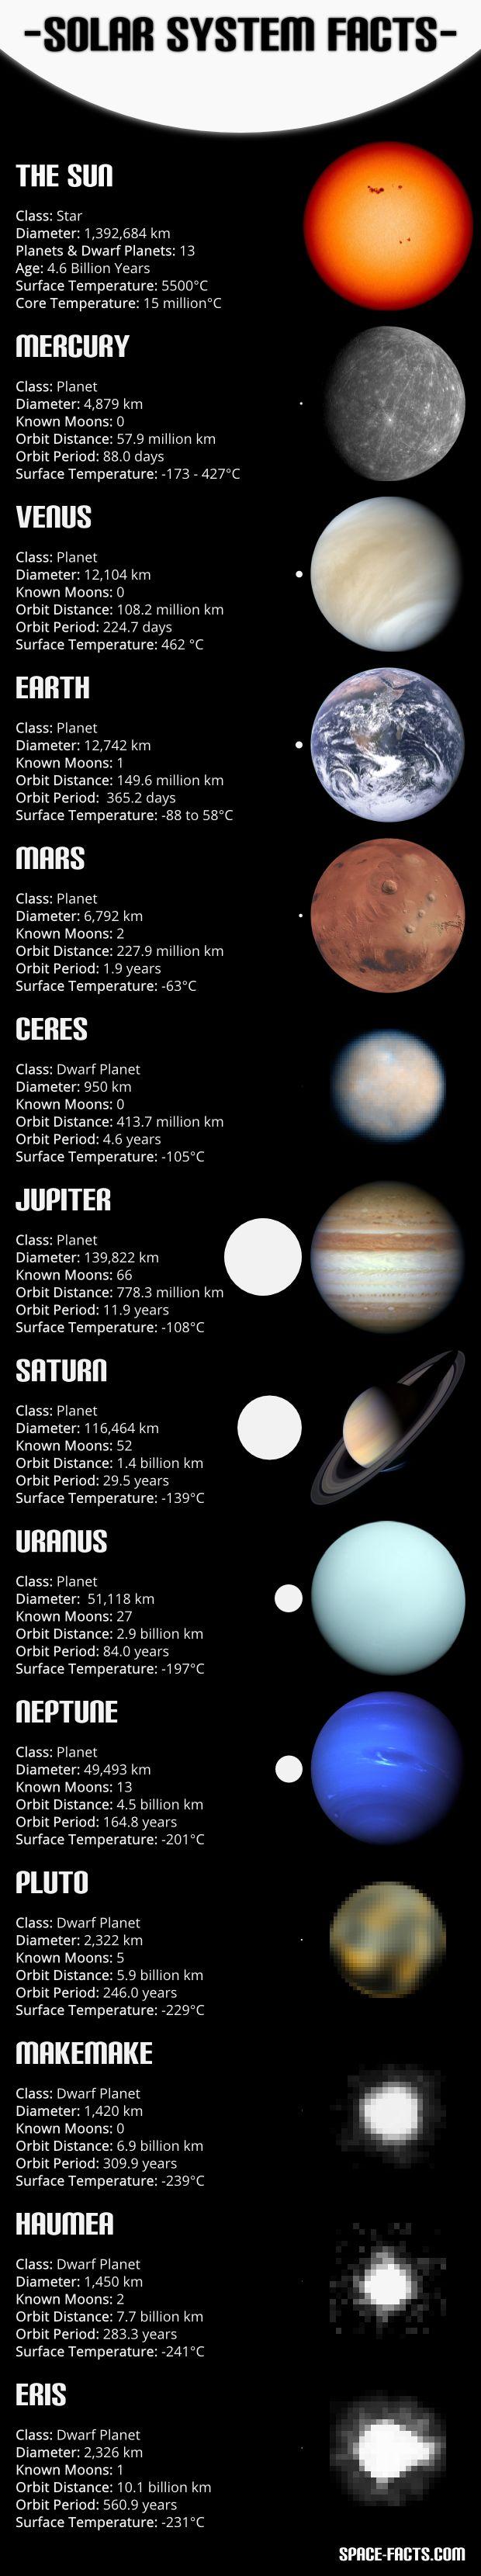 74 best moons of Jupiter essay images on Pinterest | The o ...